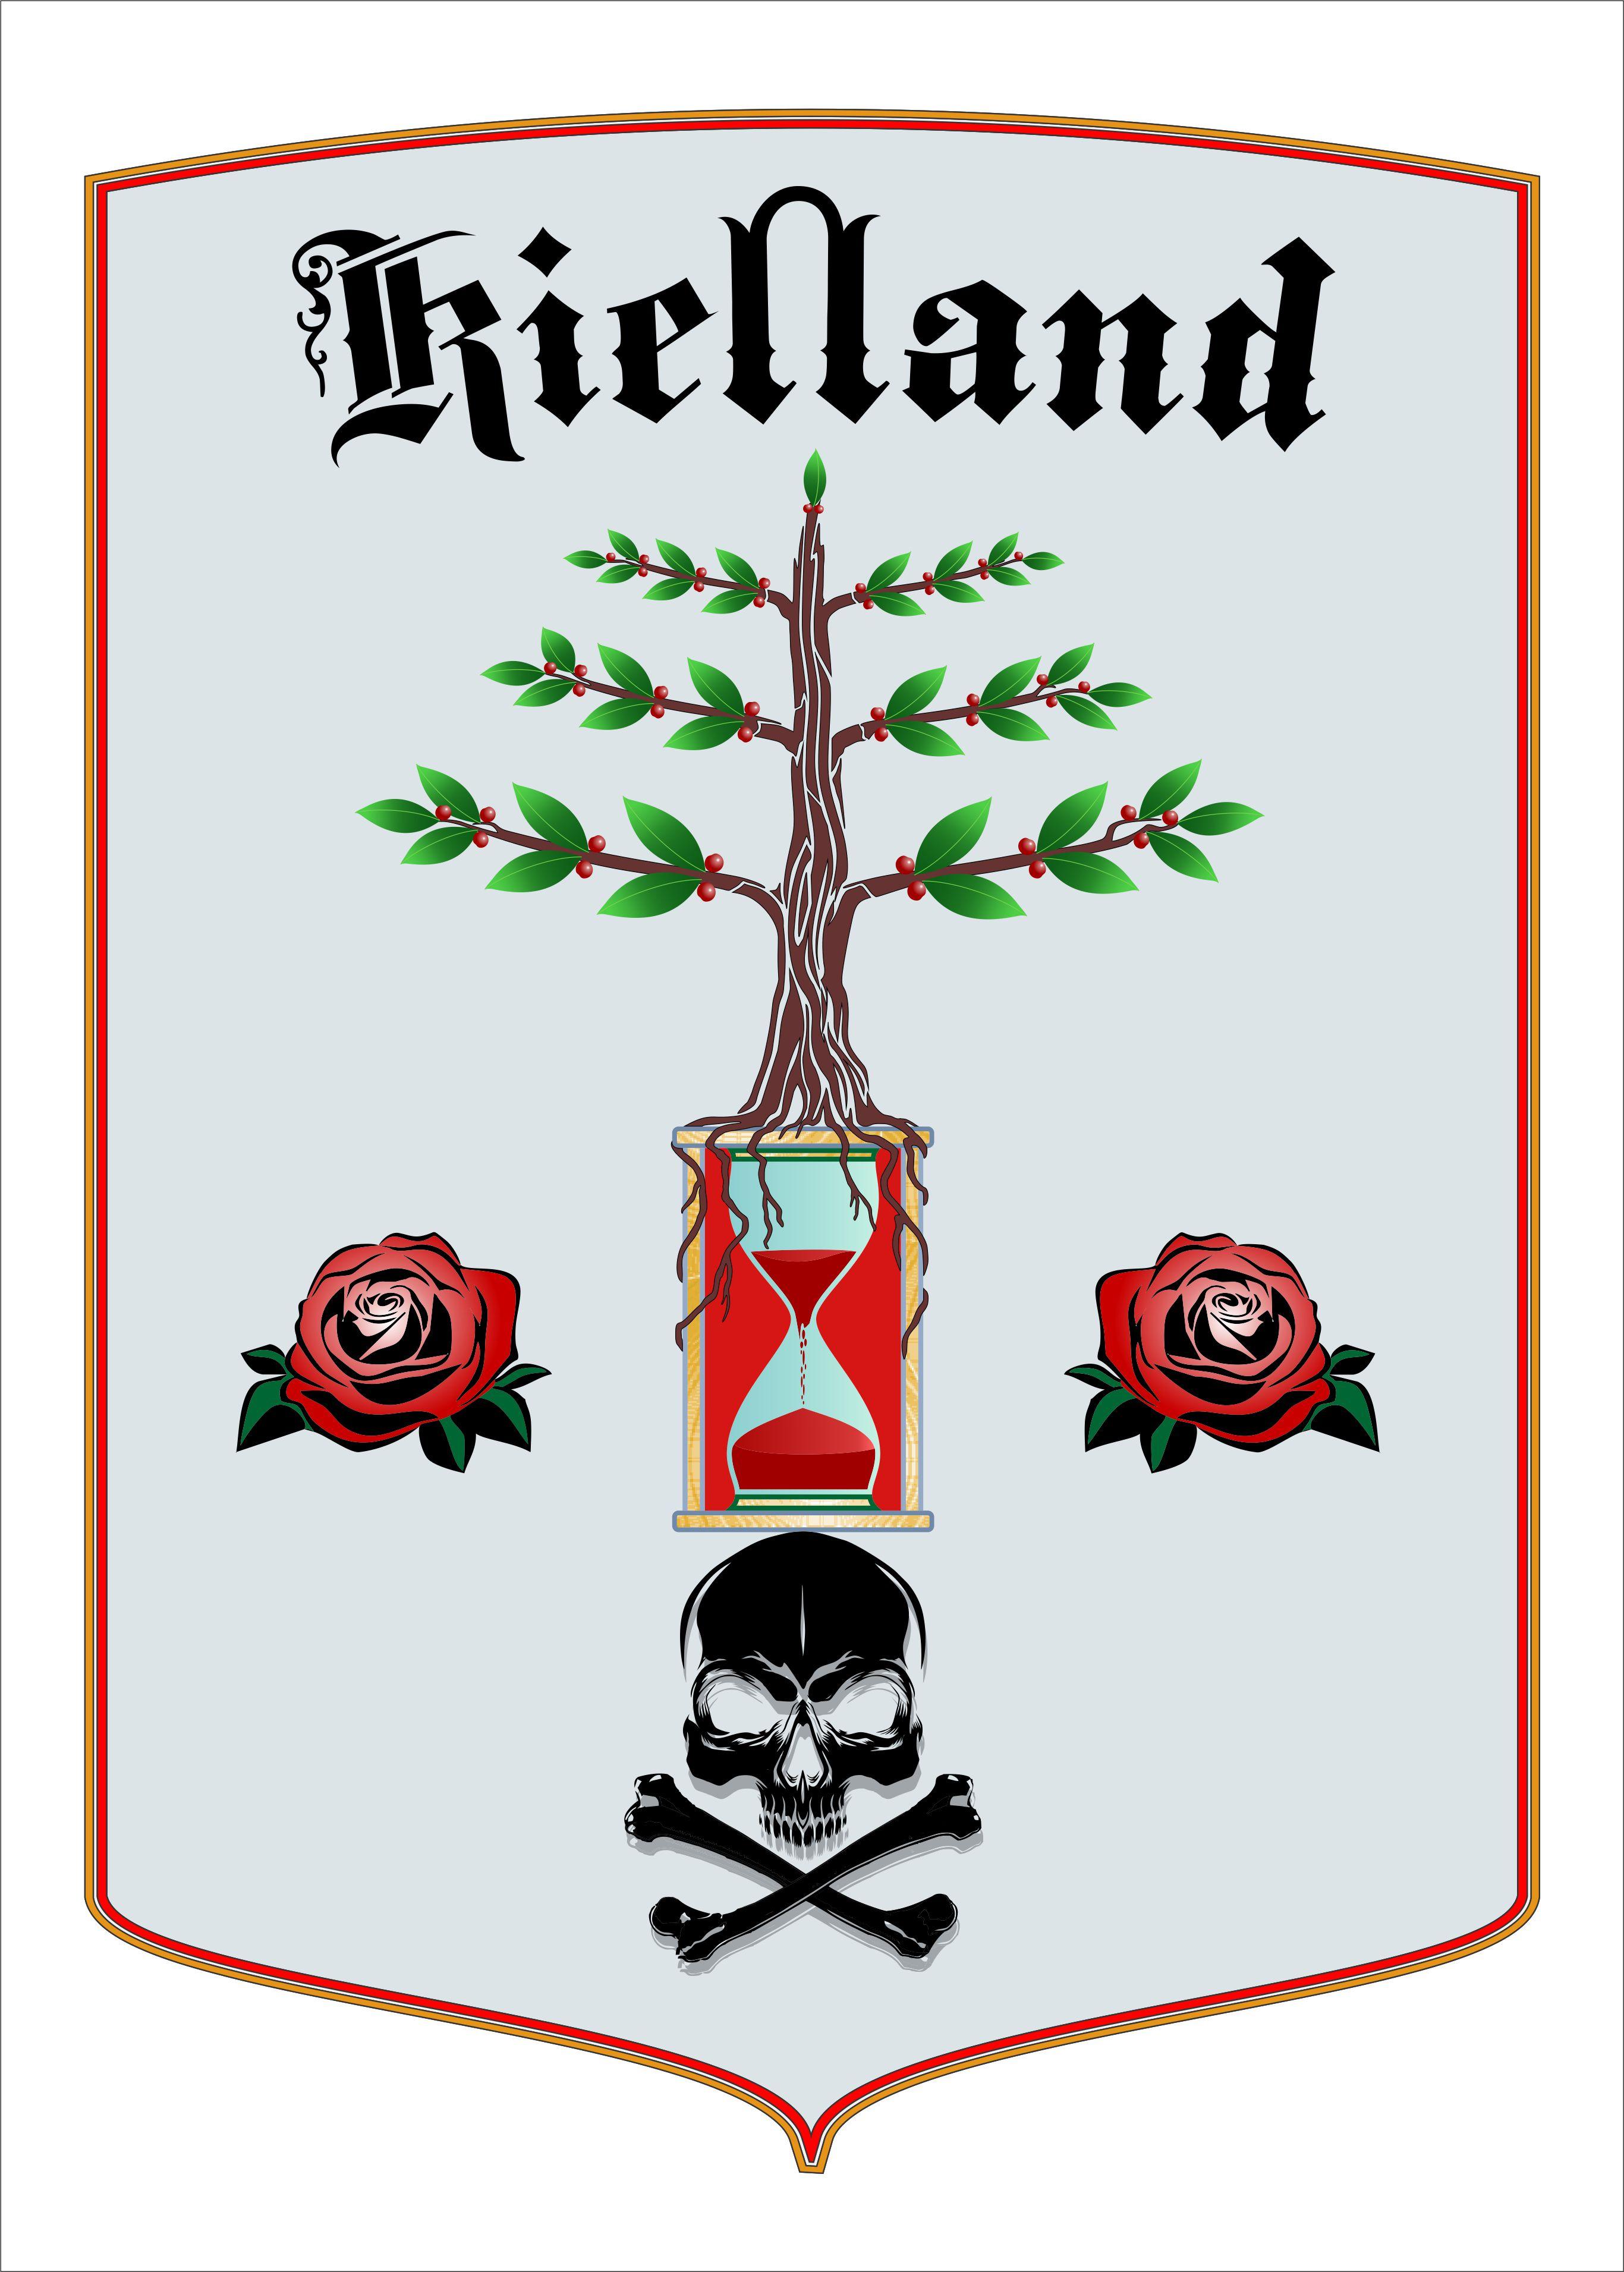 Kielland våpenskjold